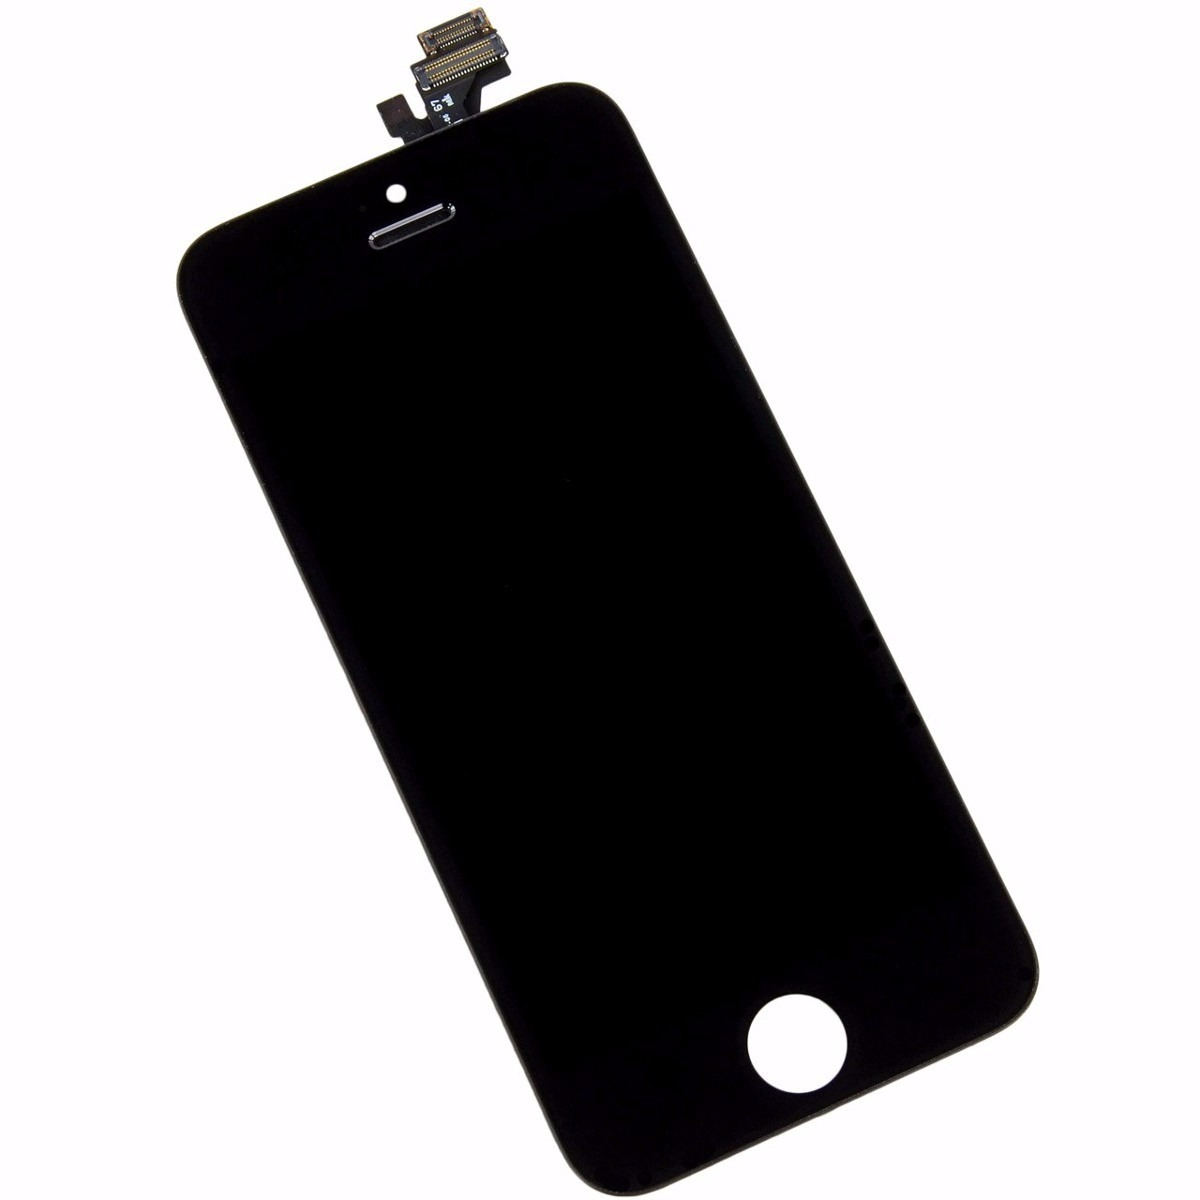 Tela Touch Display Módulo iPhone 5 5G A1428 Preto Original